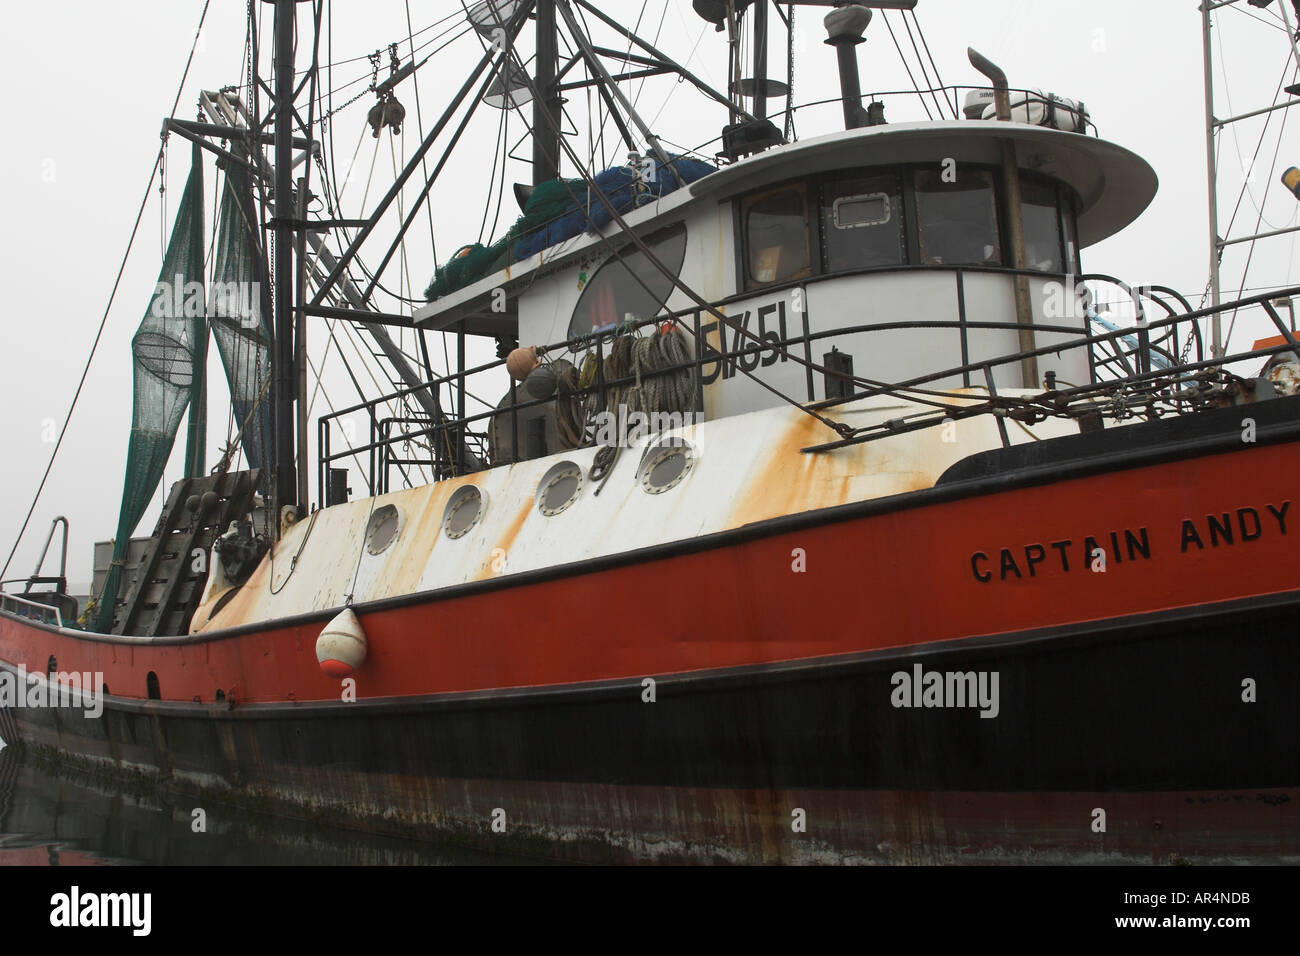 Commercial fishing boats newport oregon stock photos for Commercial fishing boats for sale in oregon